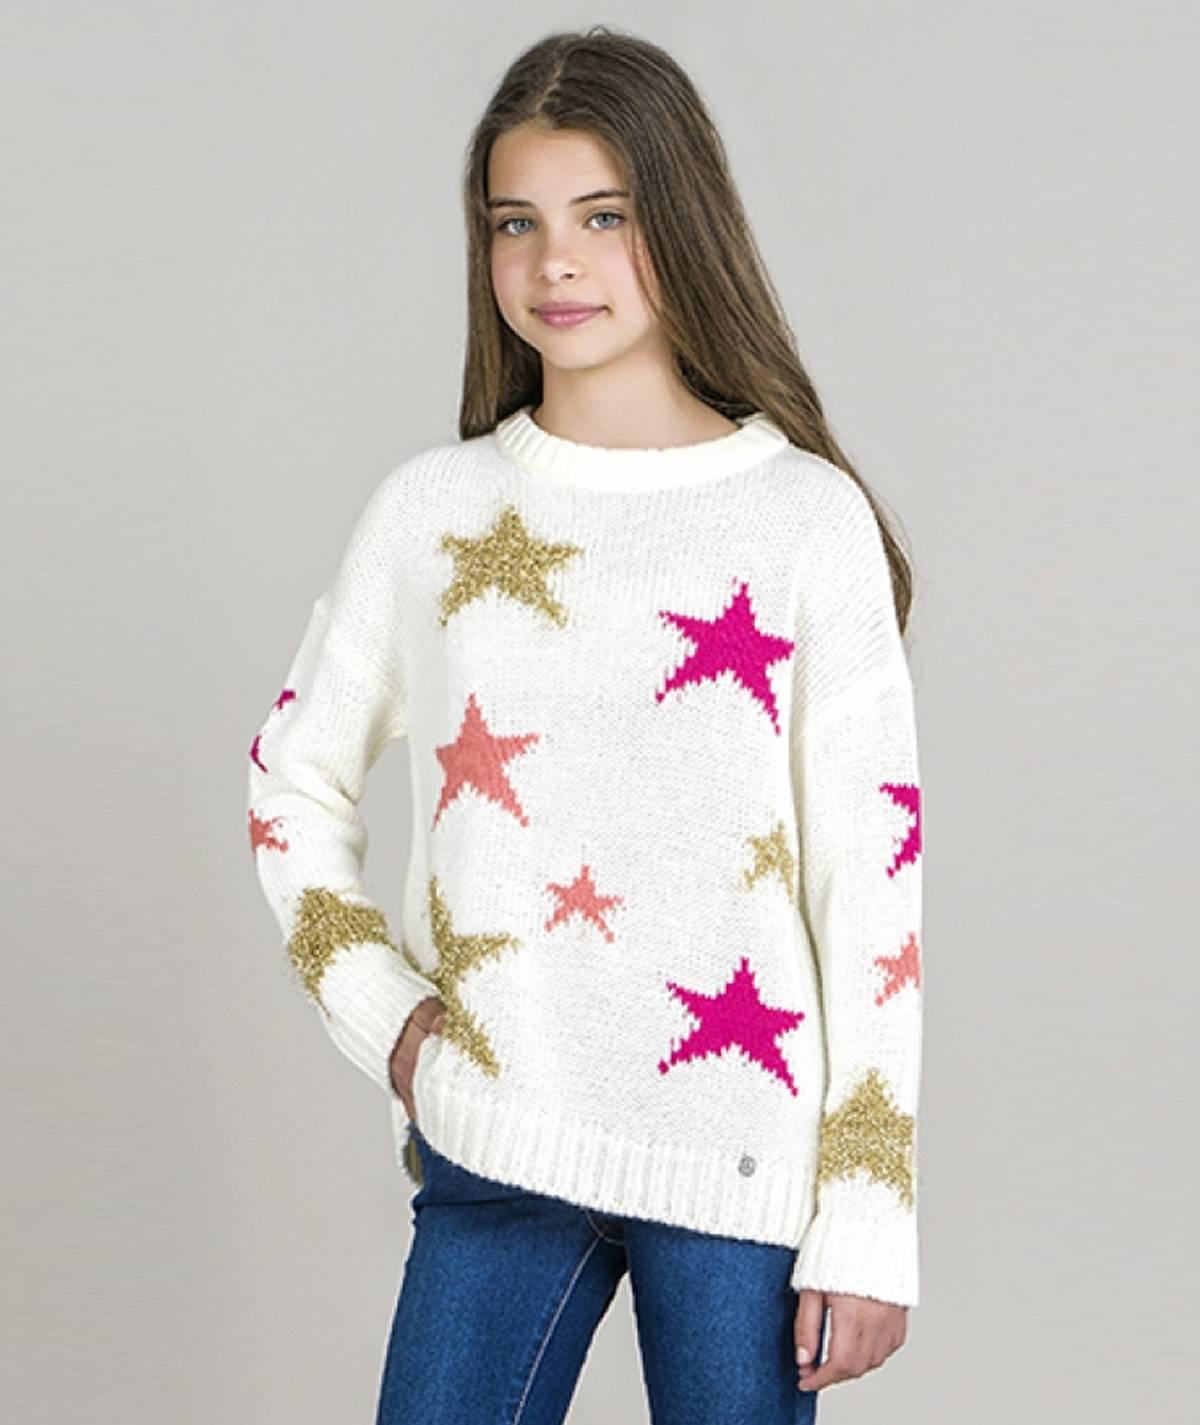 Camisola  motivo estrelas